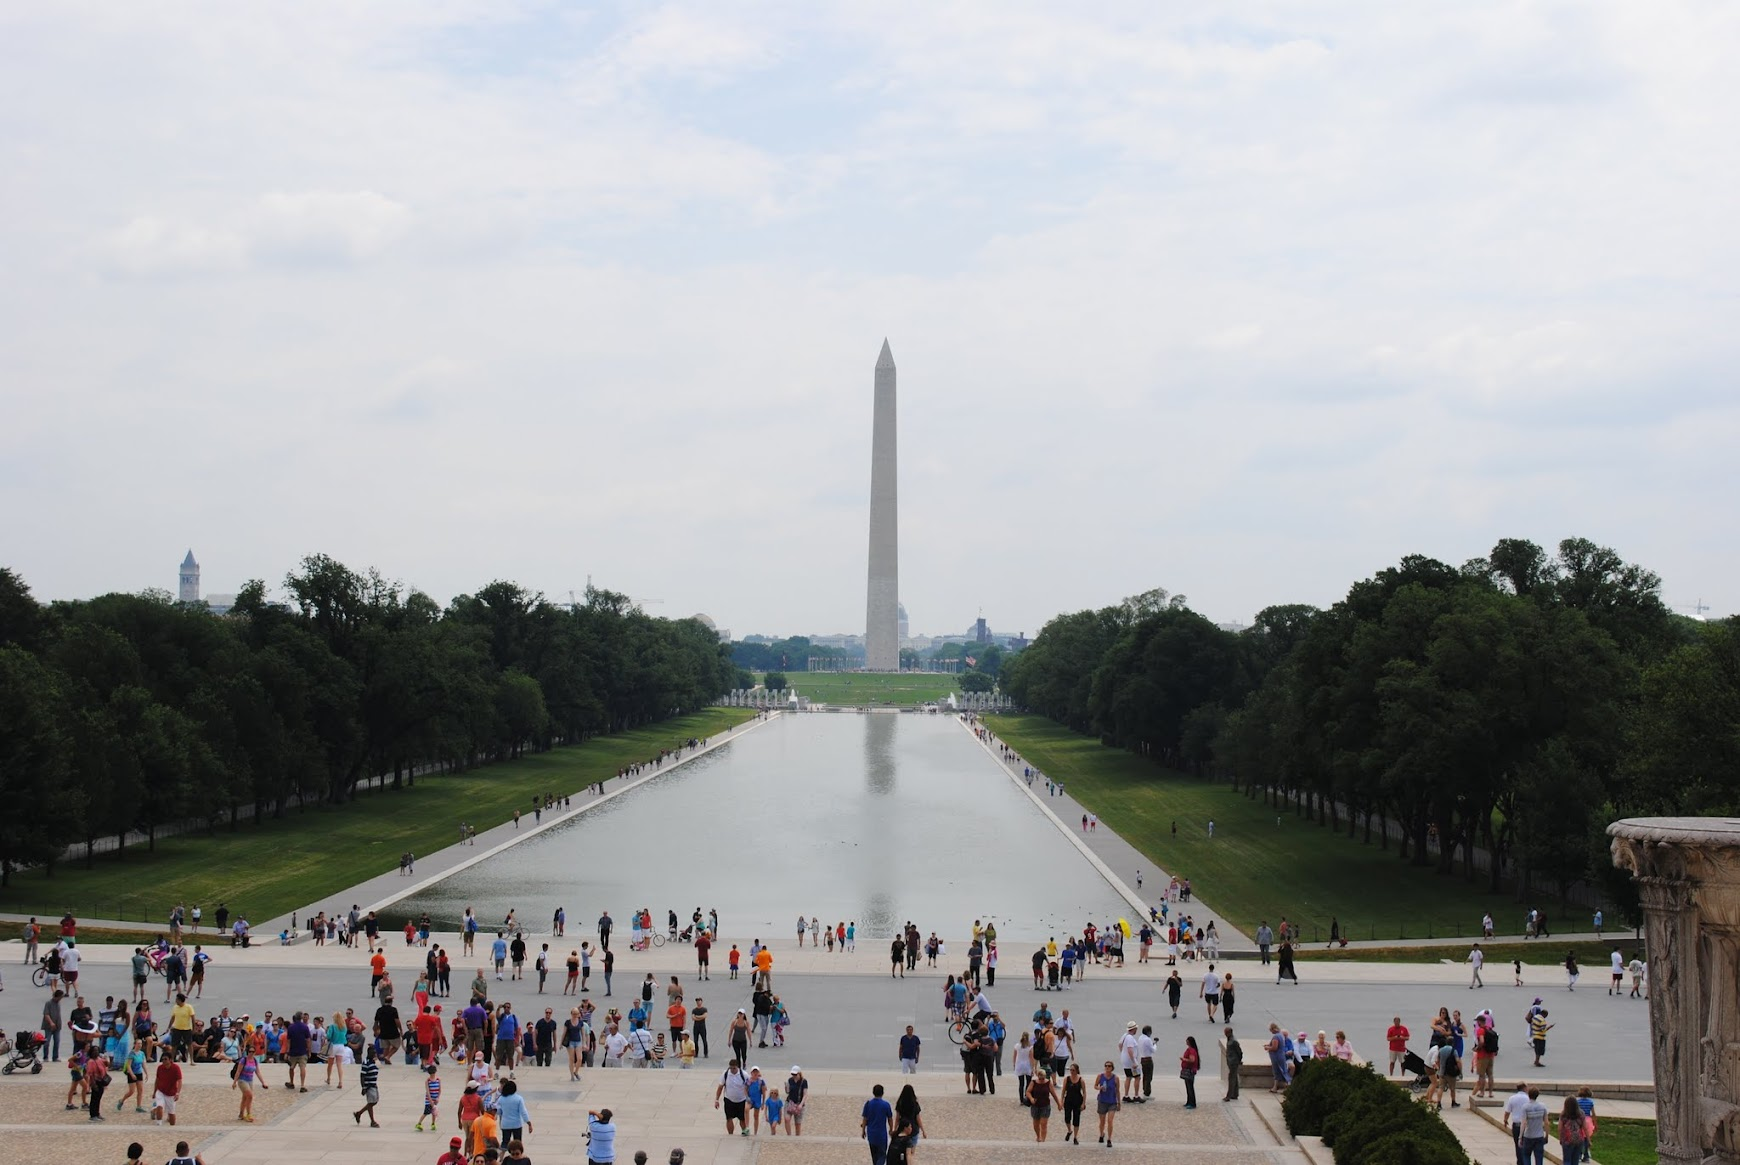 My Photos: Washington D.C.